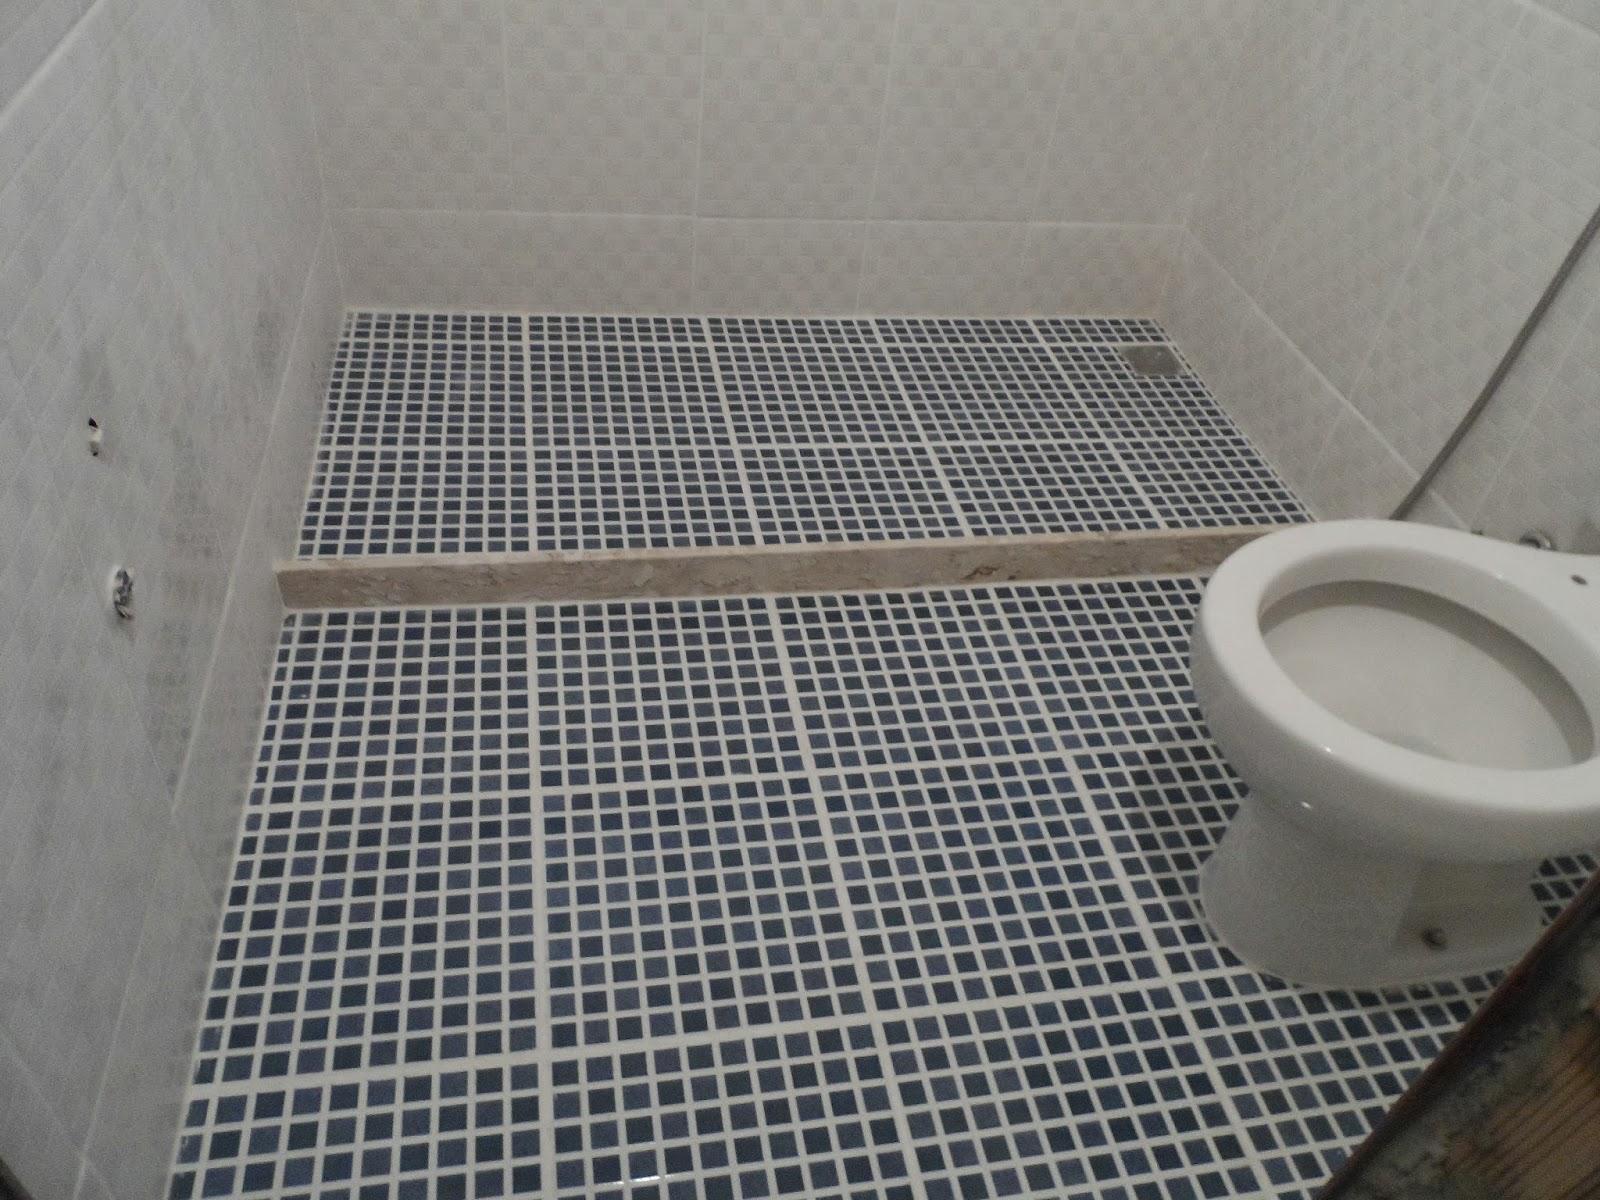 Minha casa te inspira: Banheiro azul e Branco #58534A 1600x1200 Banheiro Branco E Azul